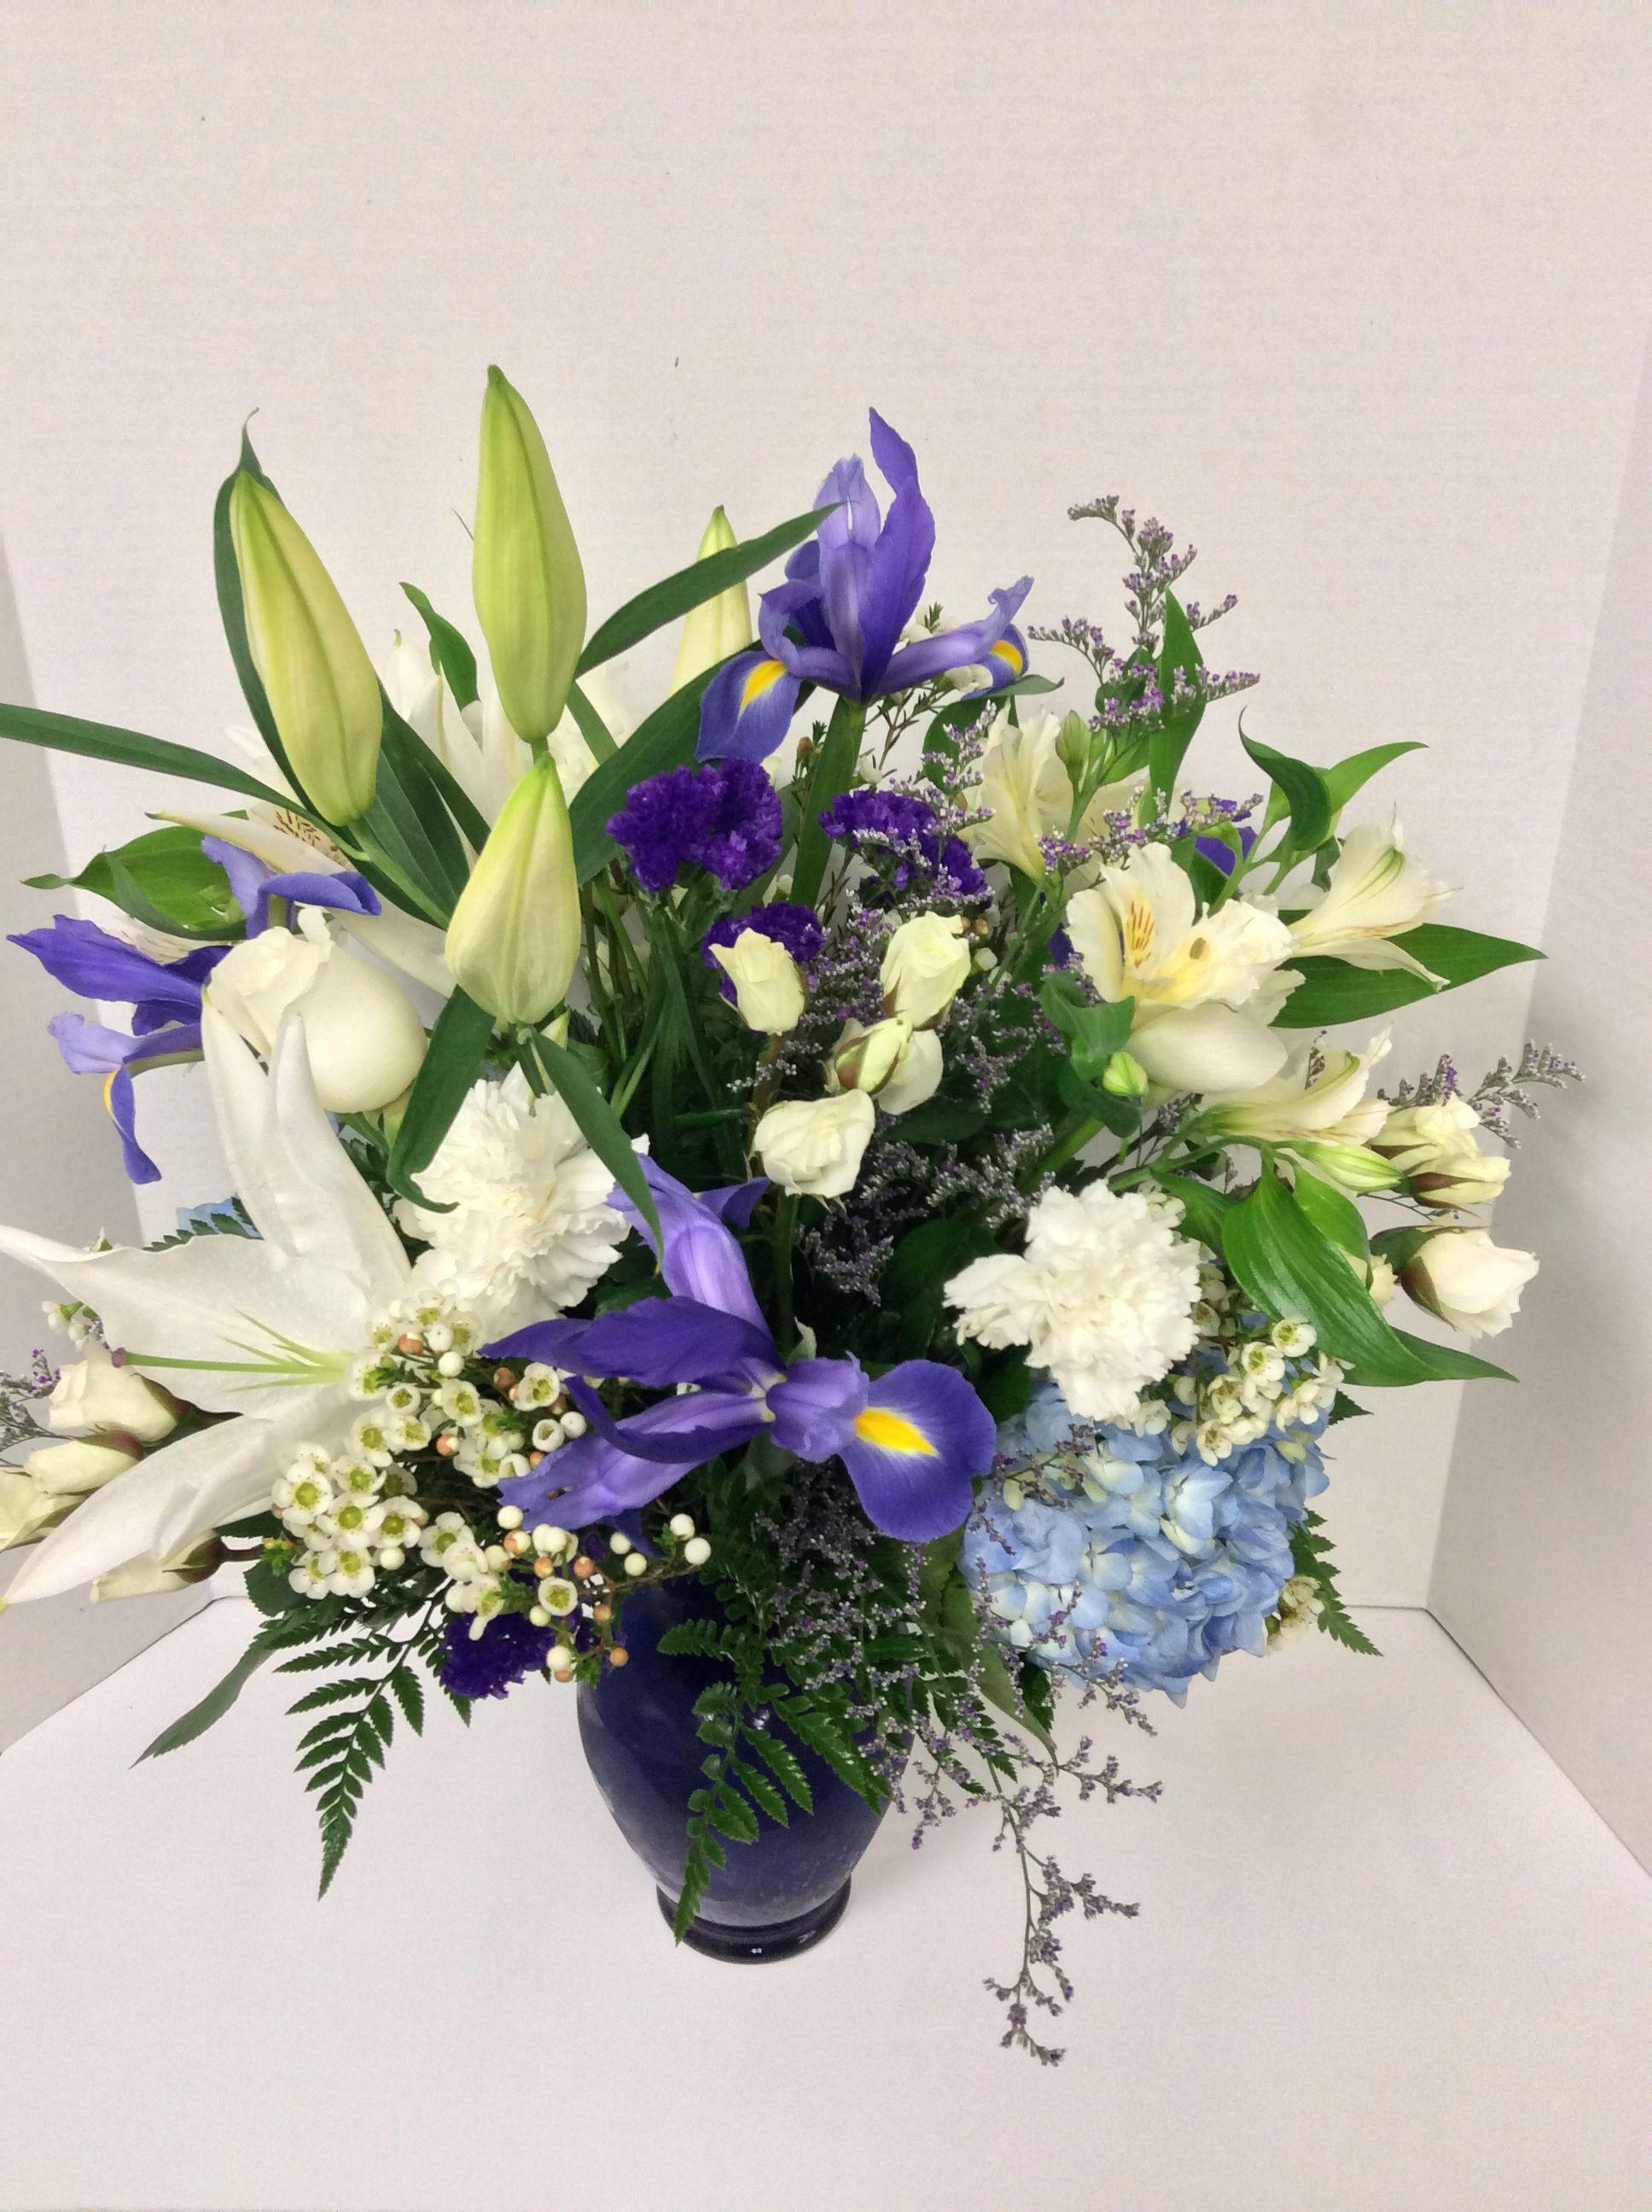 Fresh vase arrangement with white stargazer lillies purple iris fresh vase arrangement with white stargazer lillies purple iris blue hydrangea white alstroemeria izmirmasajfo